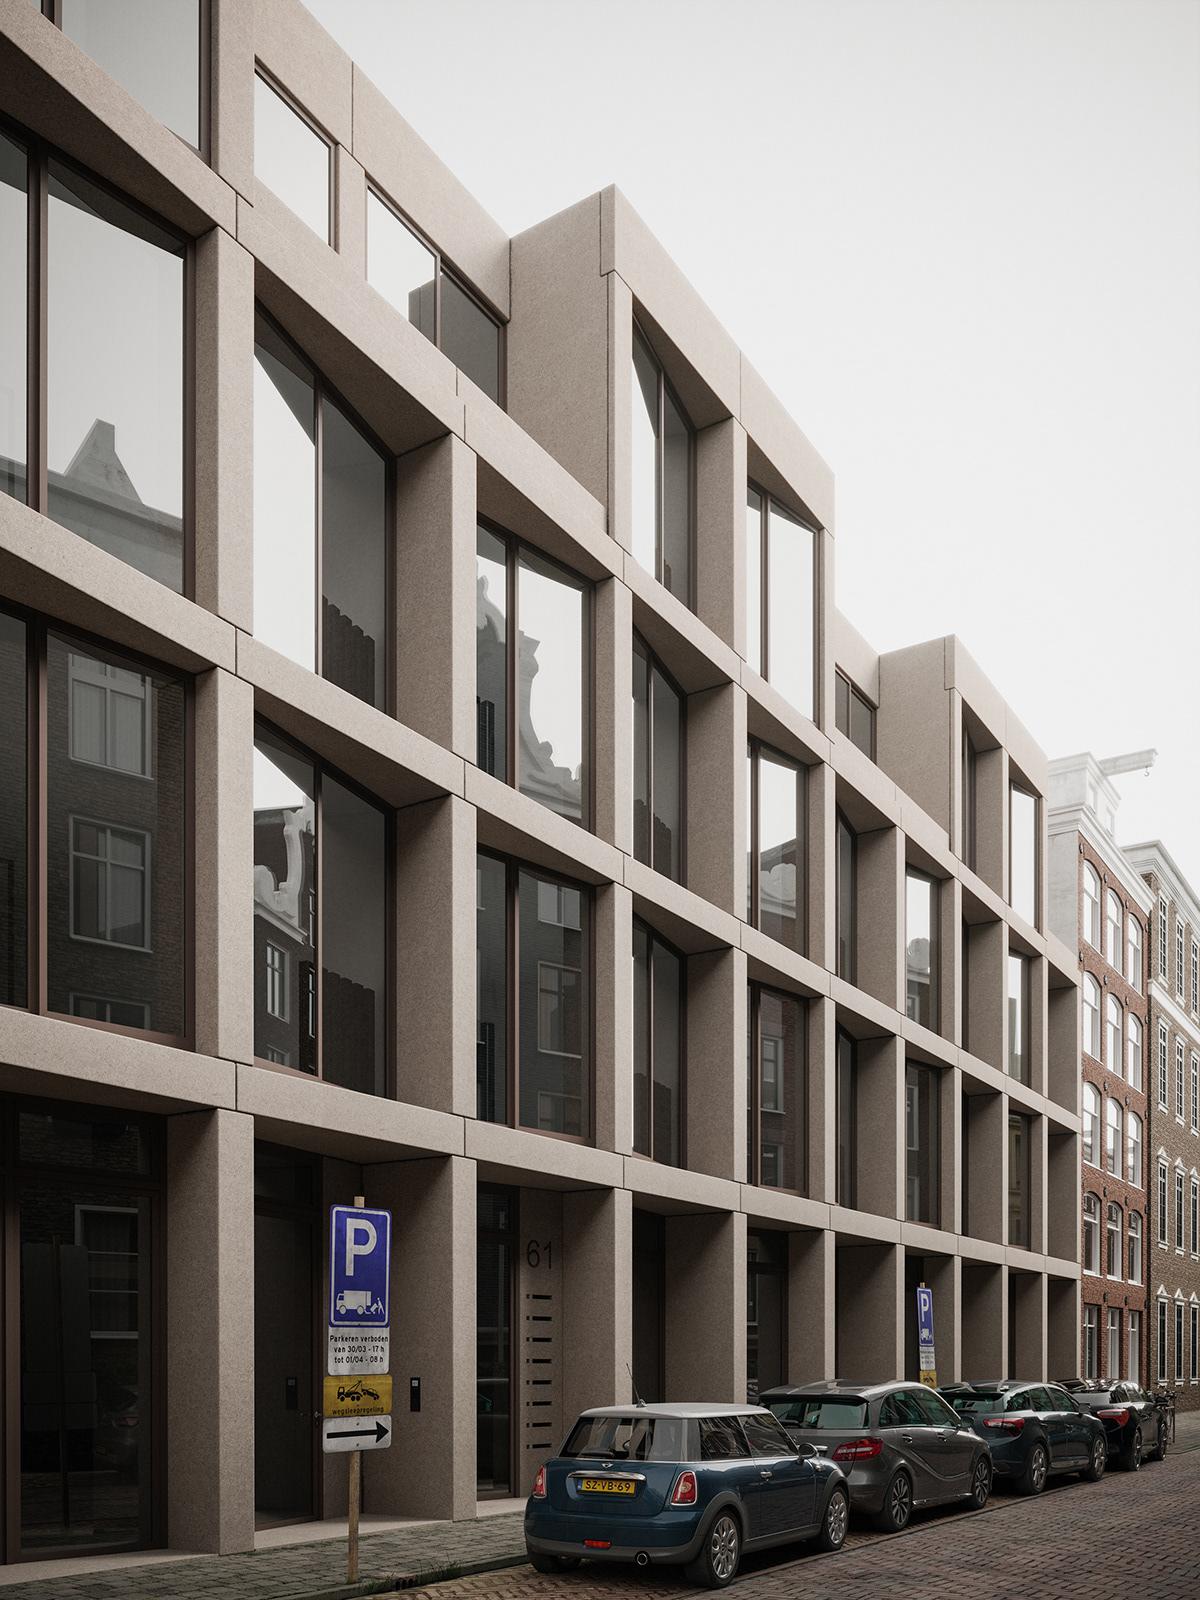 #3Dmax   #Amsterdam #architecture #CG #coronarender #coronarenderer #exterior #house #photoshop